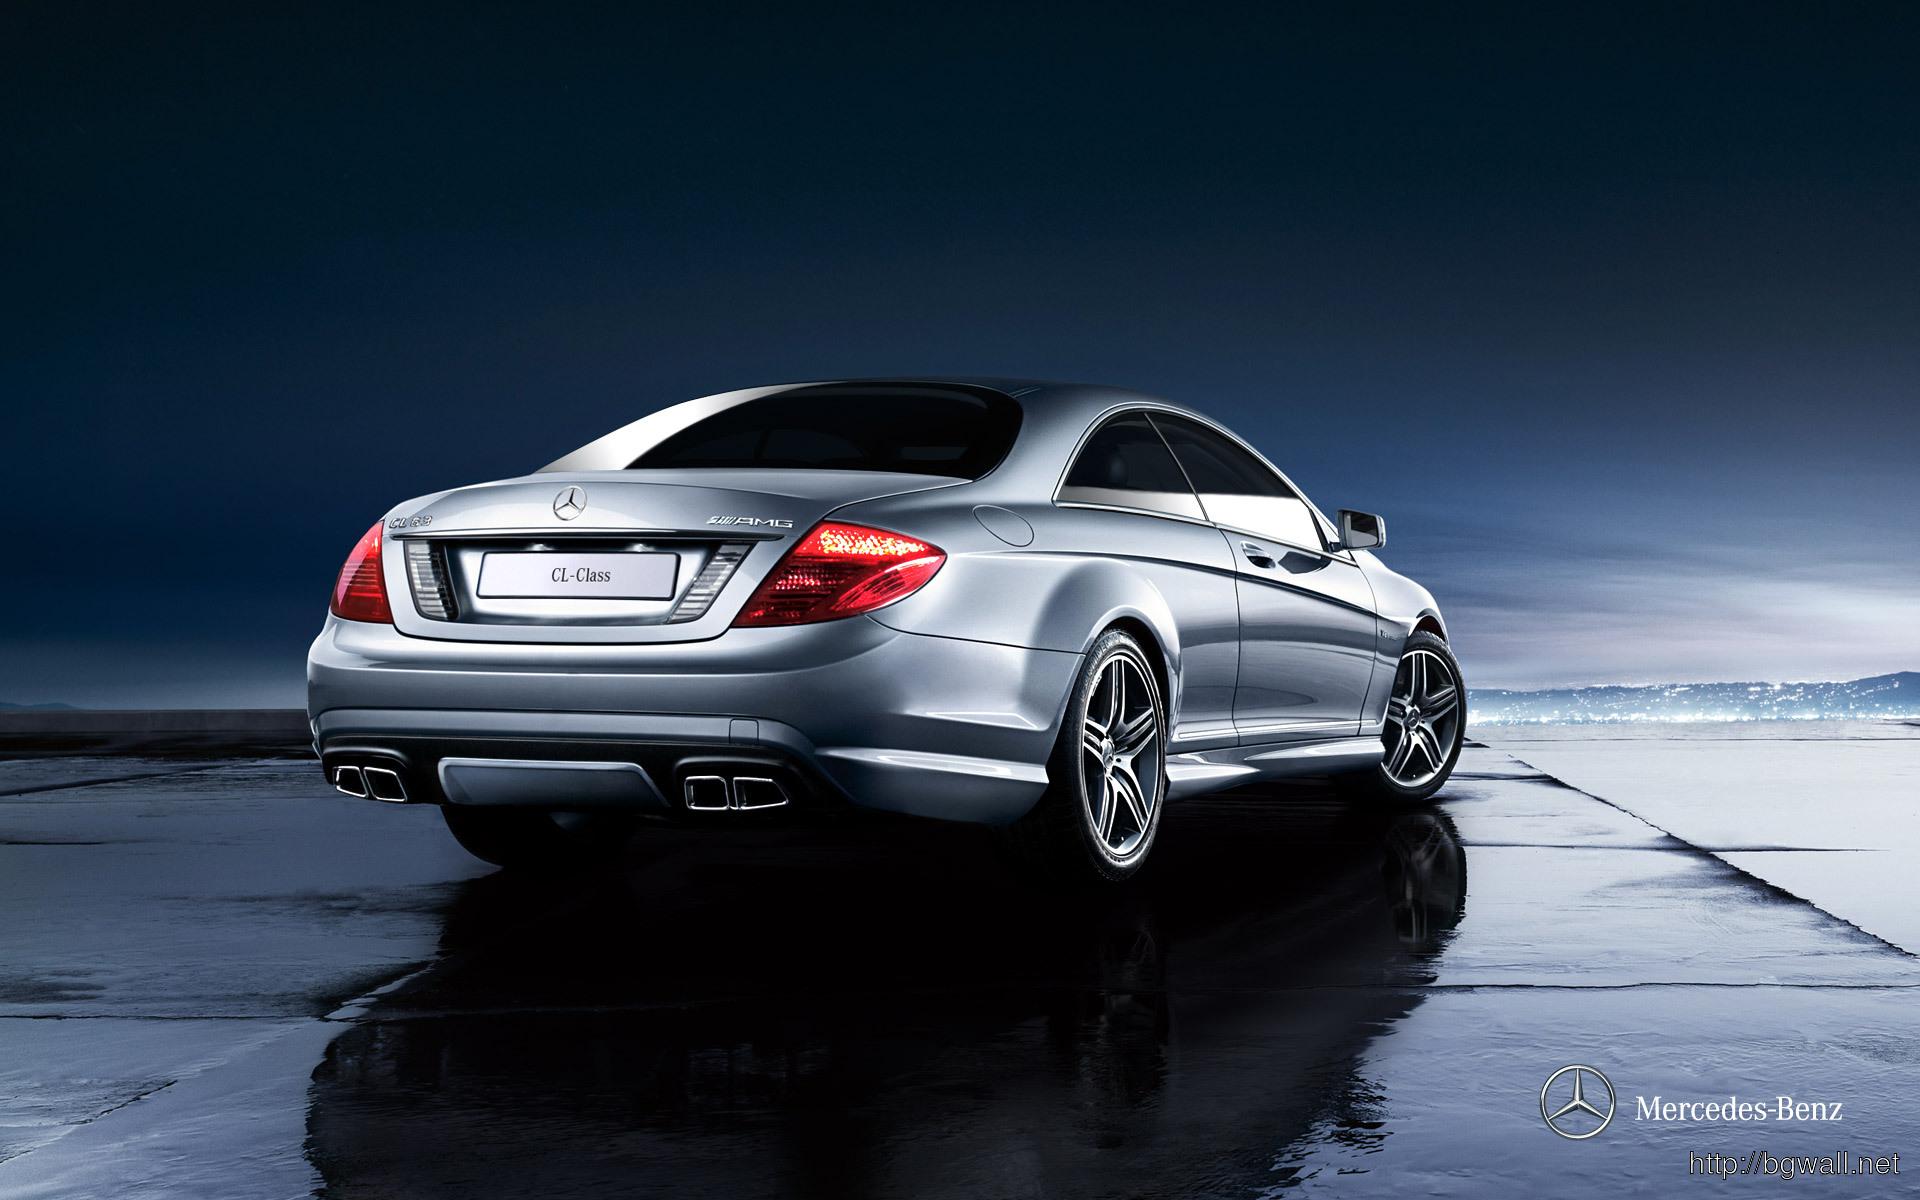 2013 mercedes benz cl 600 wallpaper 1024 640 background for Mercedes benz 640